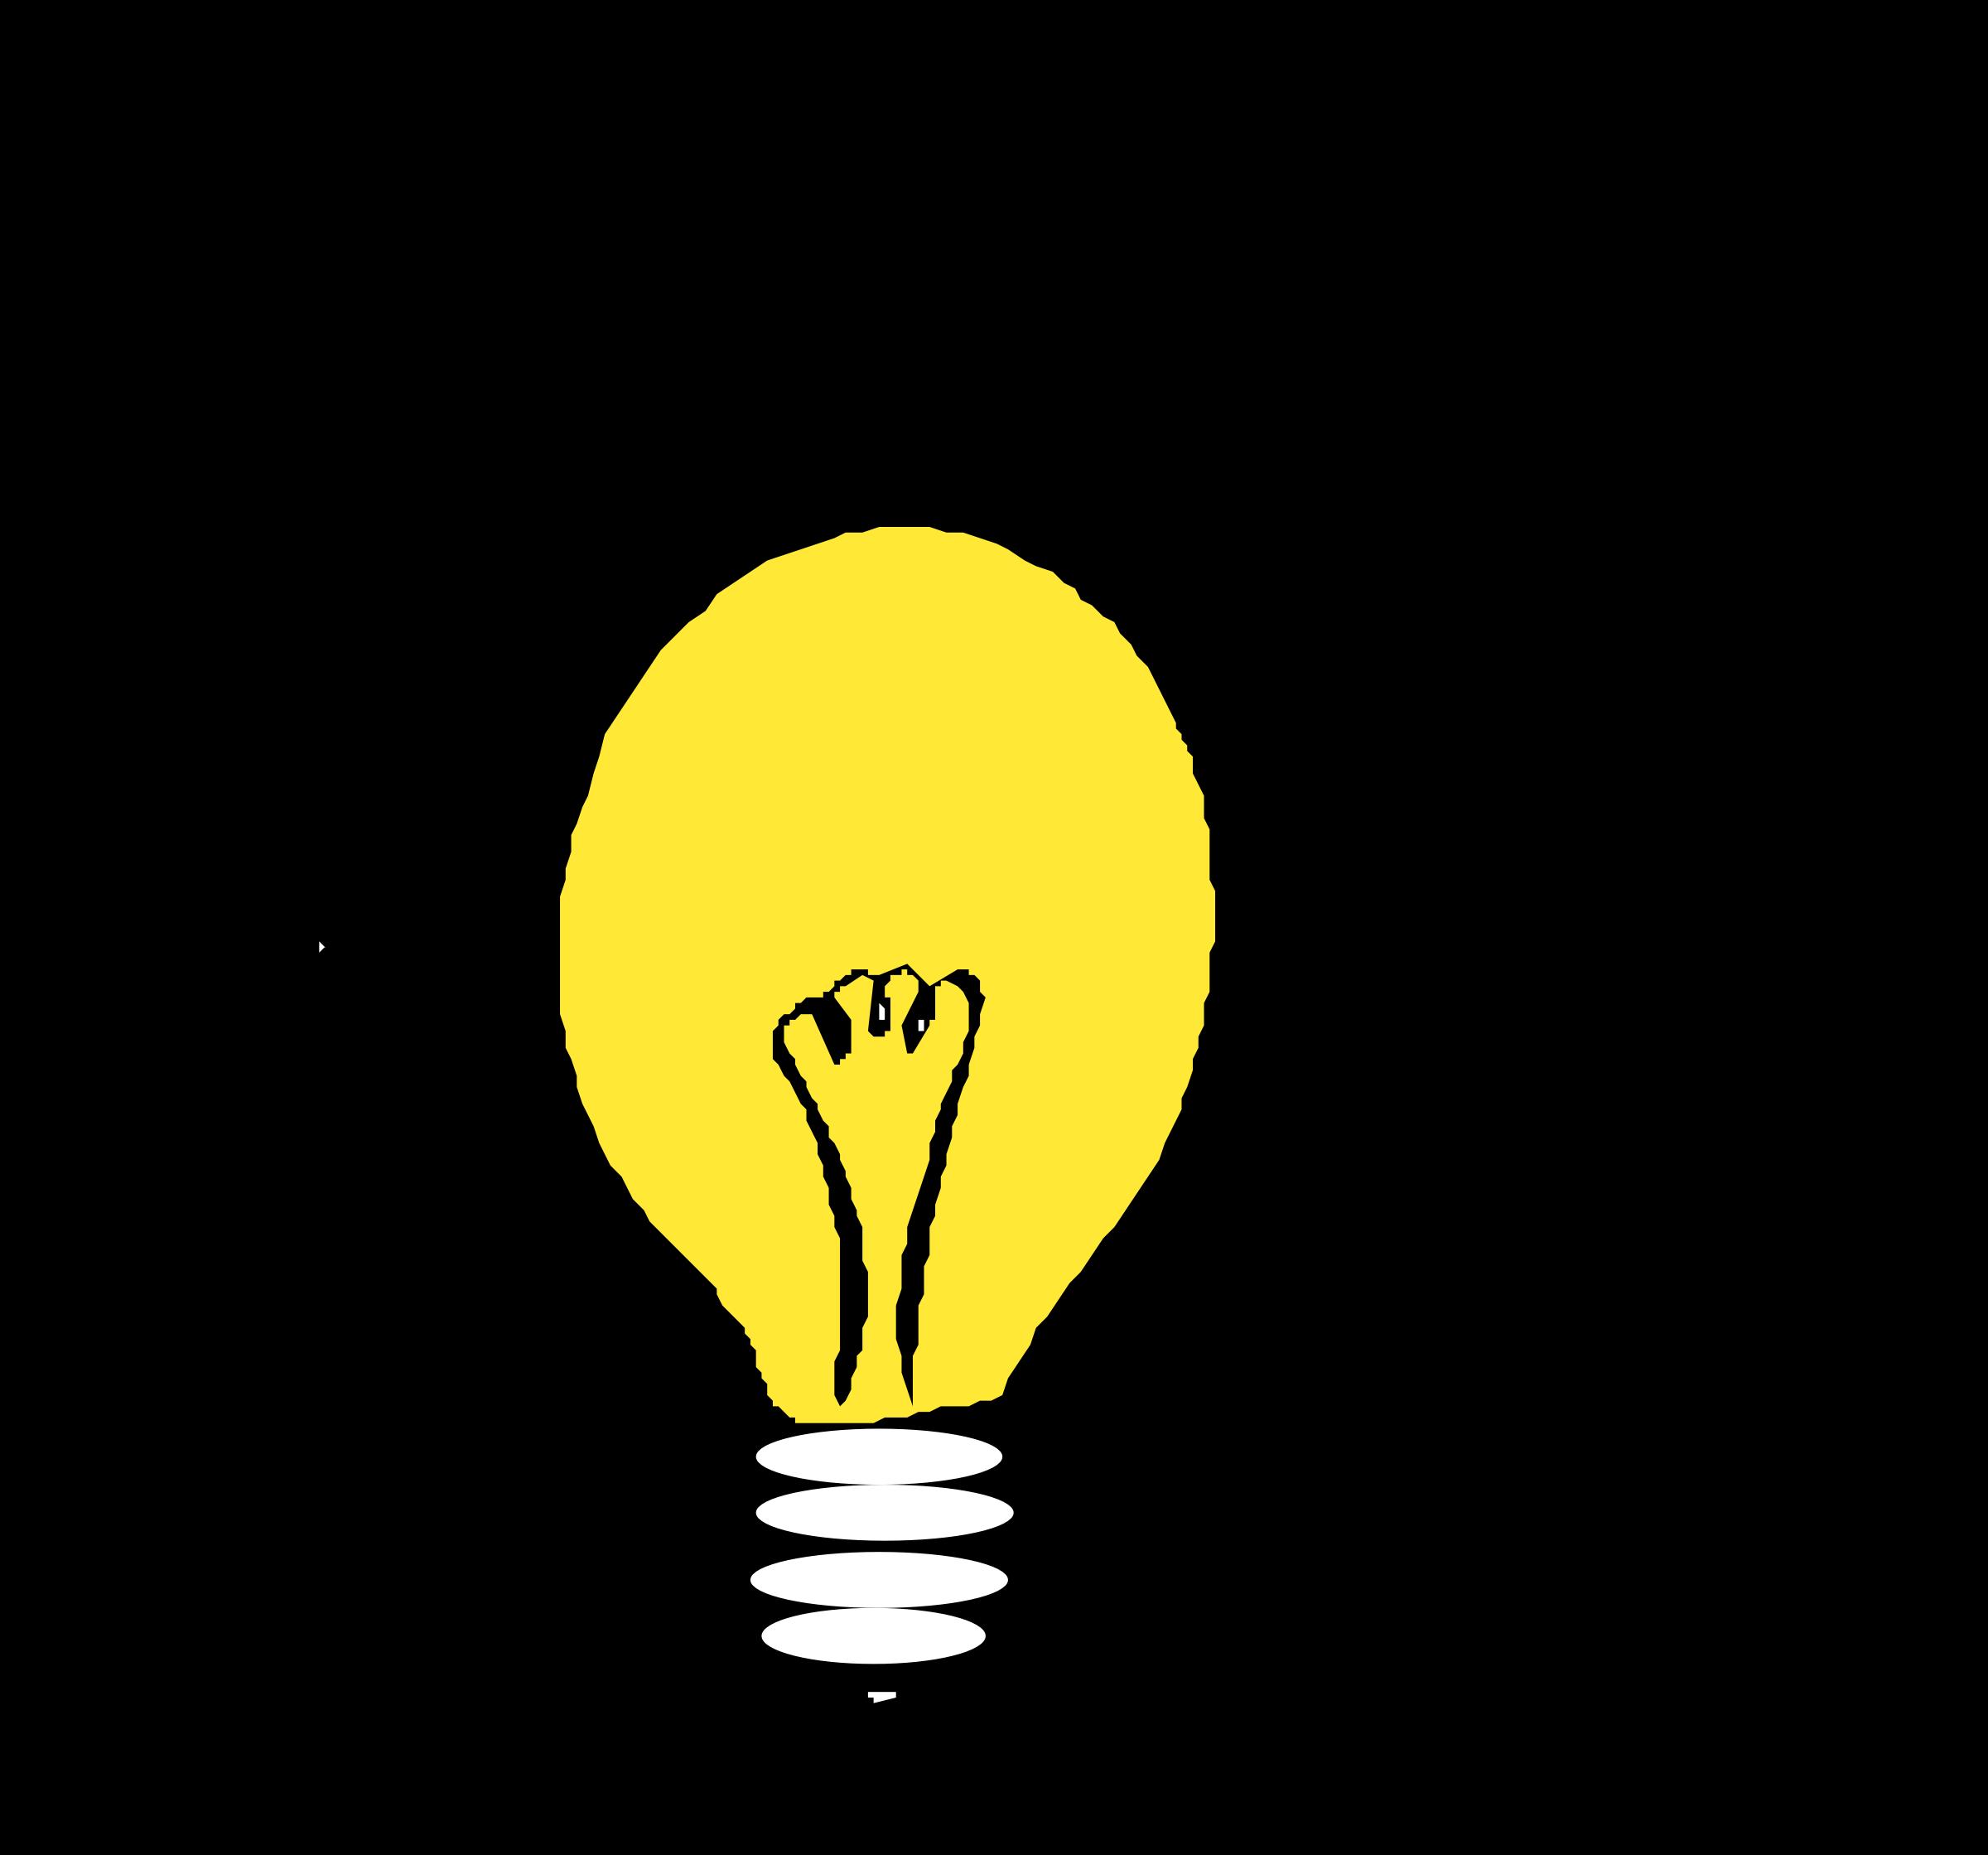 Lightbulb light bulb clip art at vector 2 image.